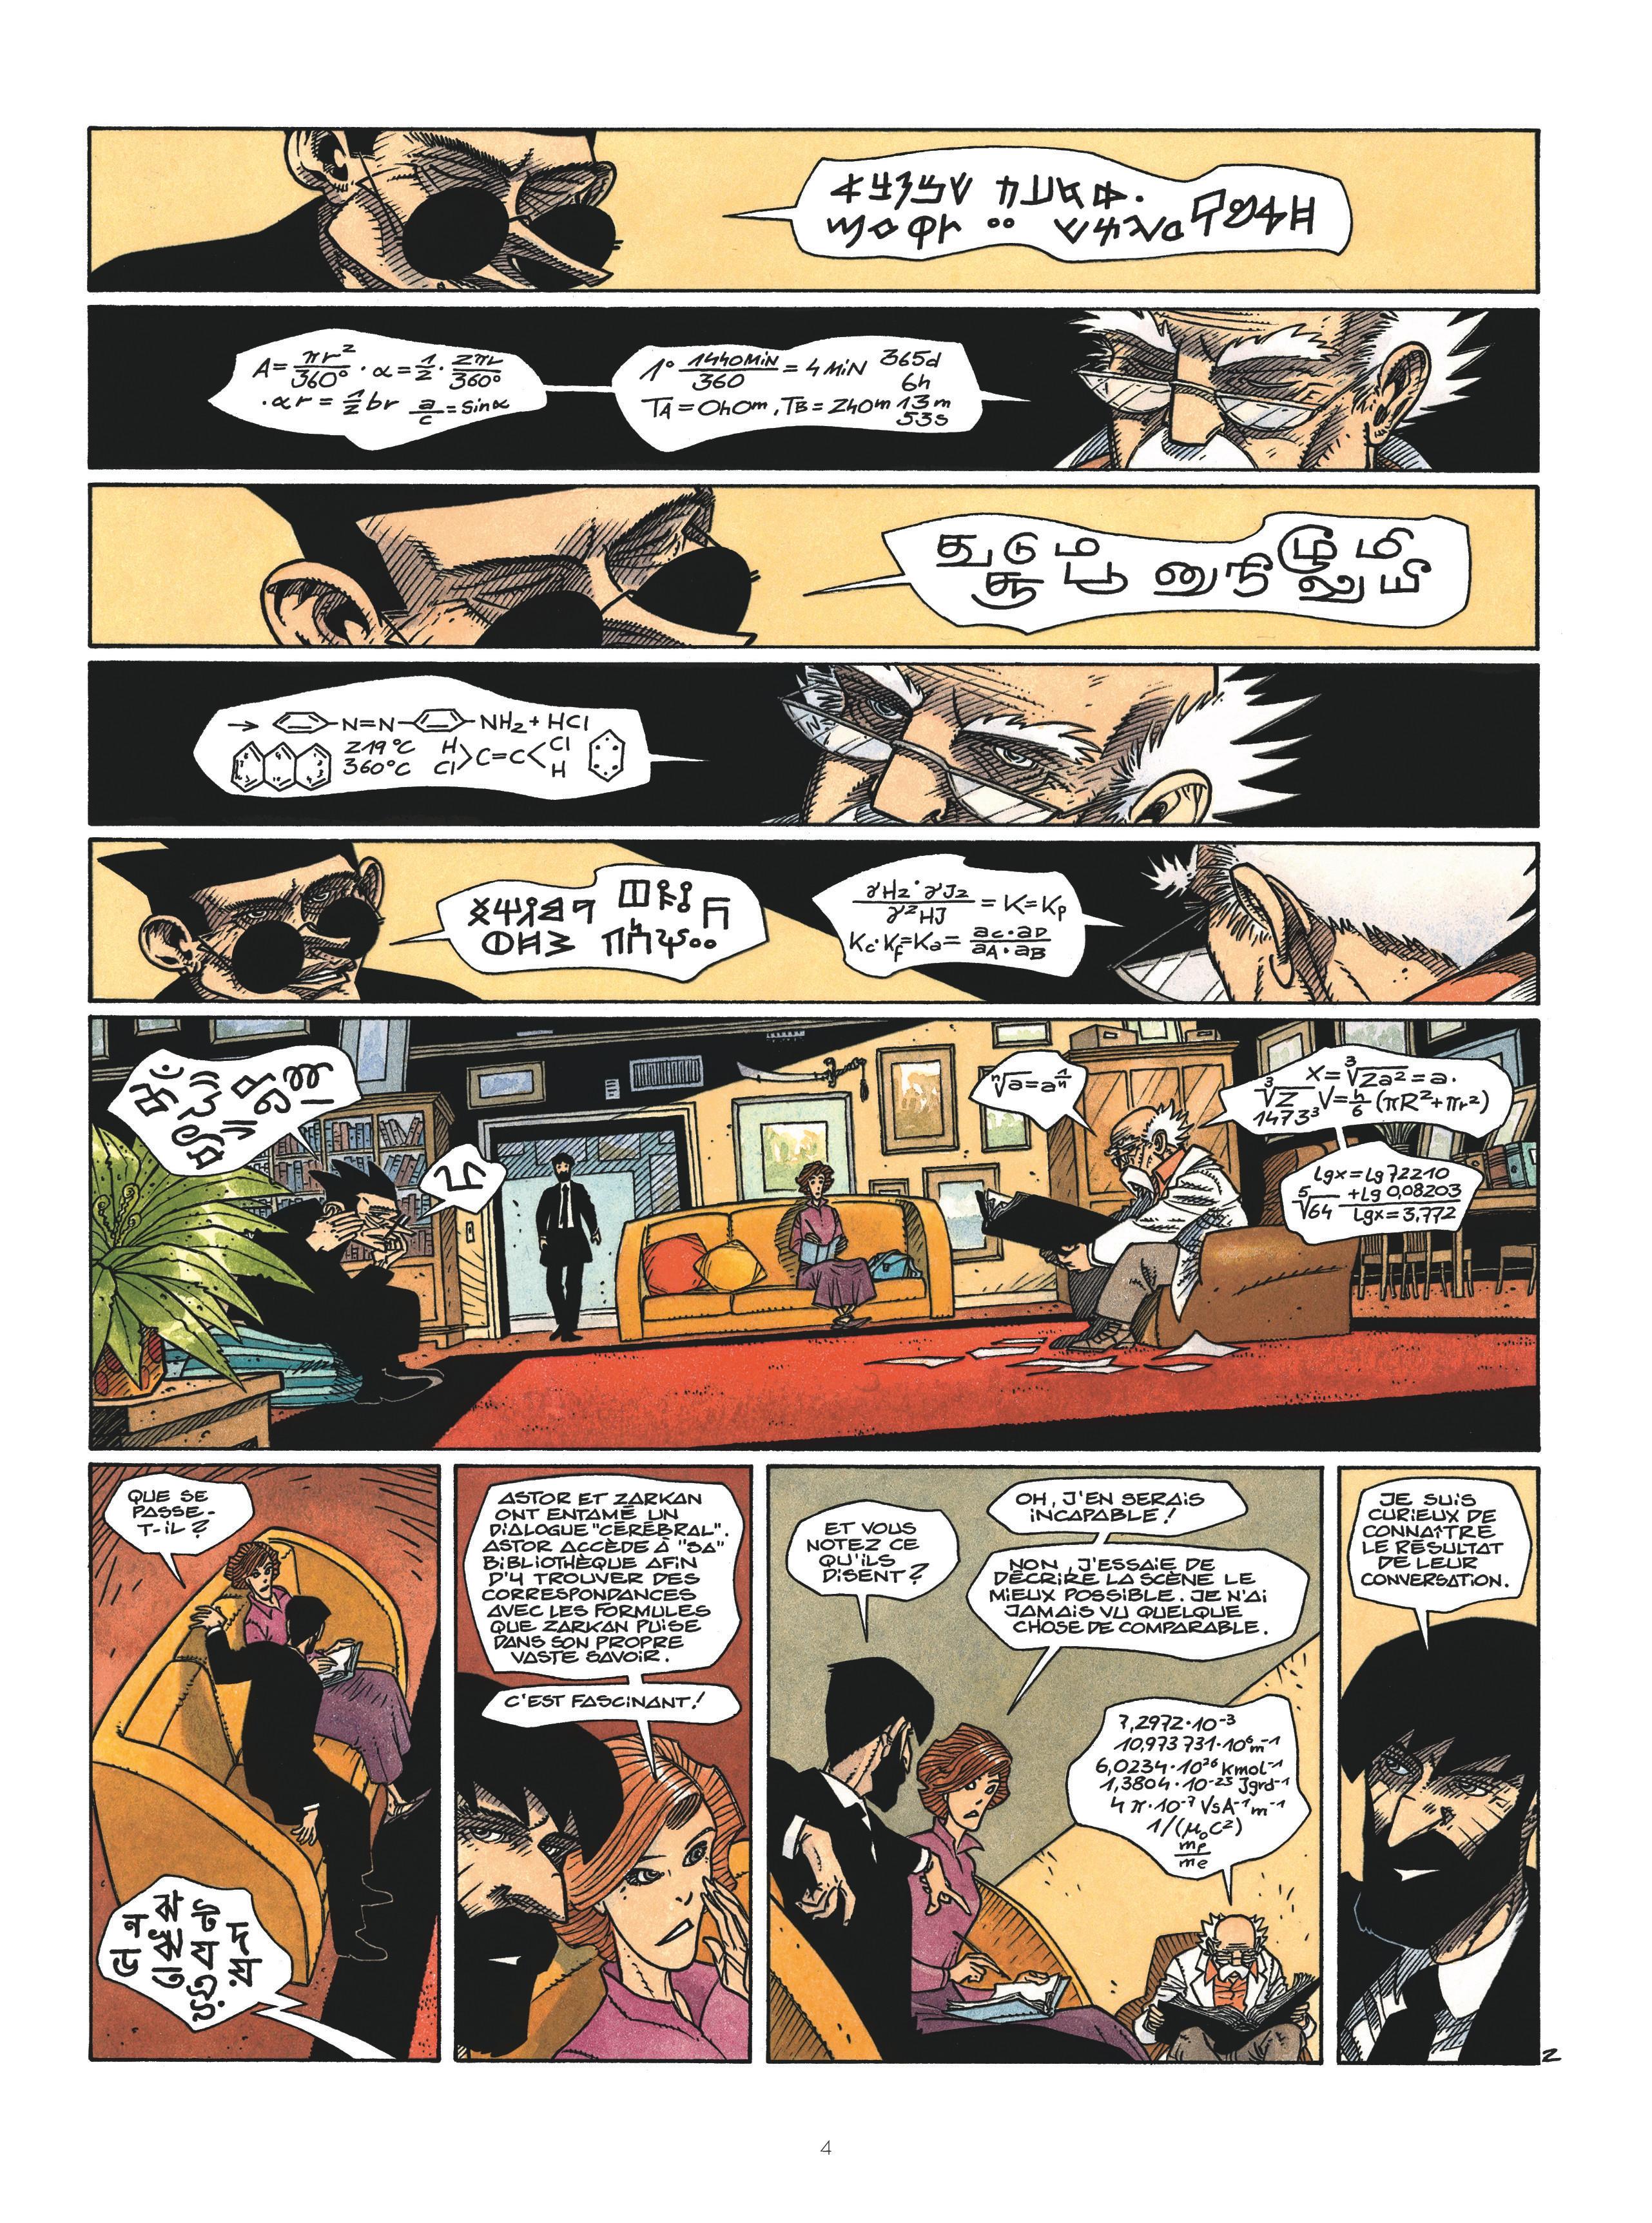 Capricorne#19_Page 4